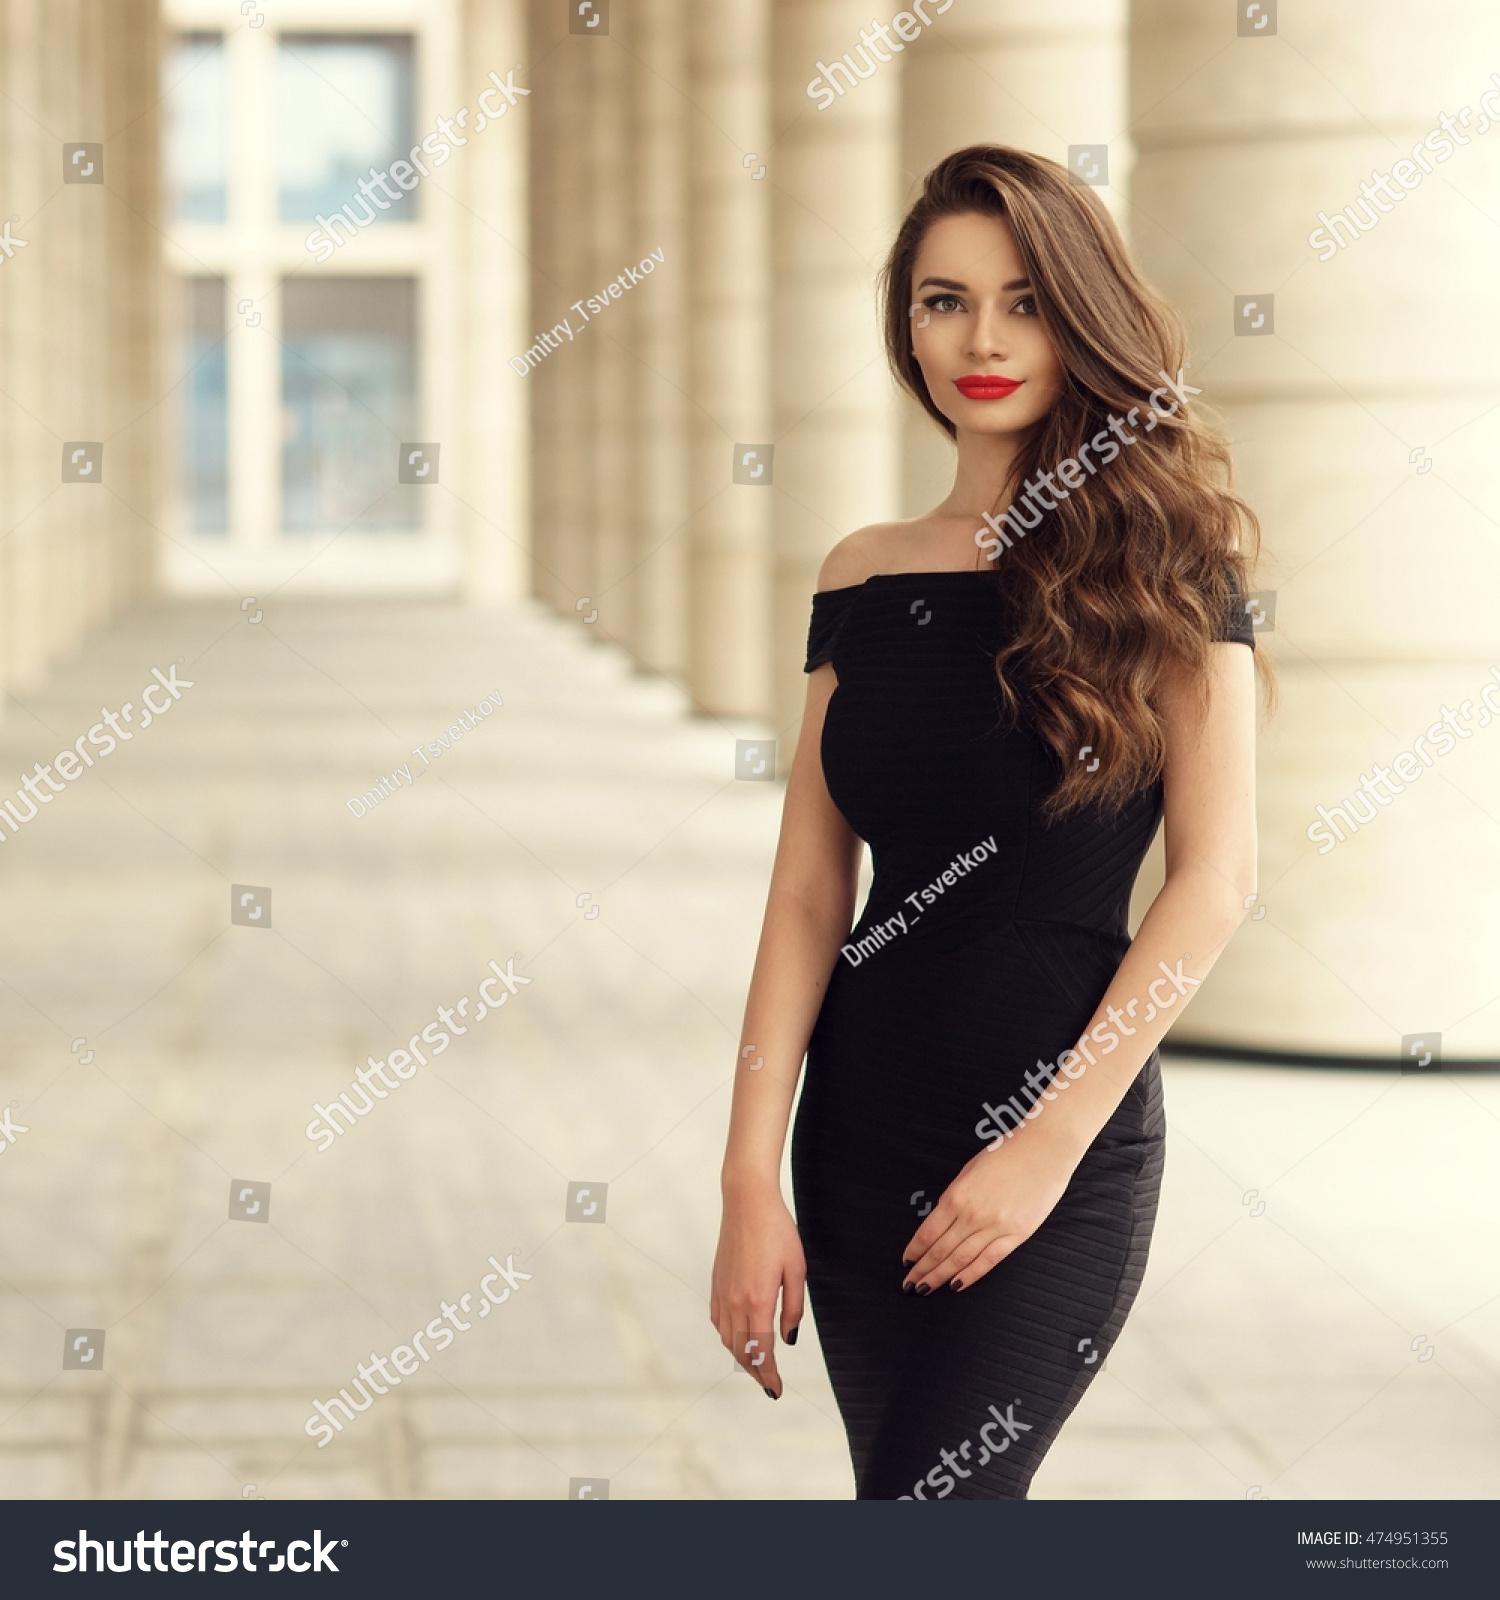 Classy And Glamorous Photo: Young Elegant Girl Posing City Street Stock Photo